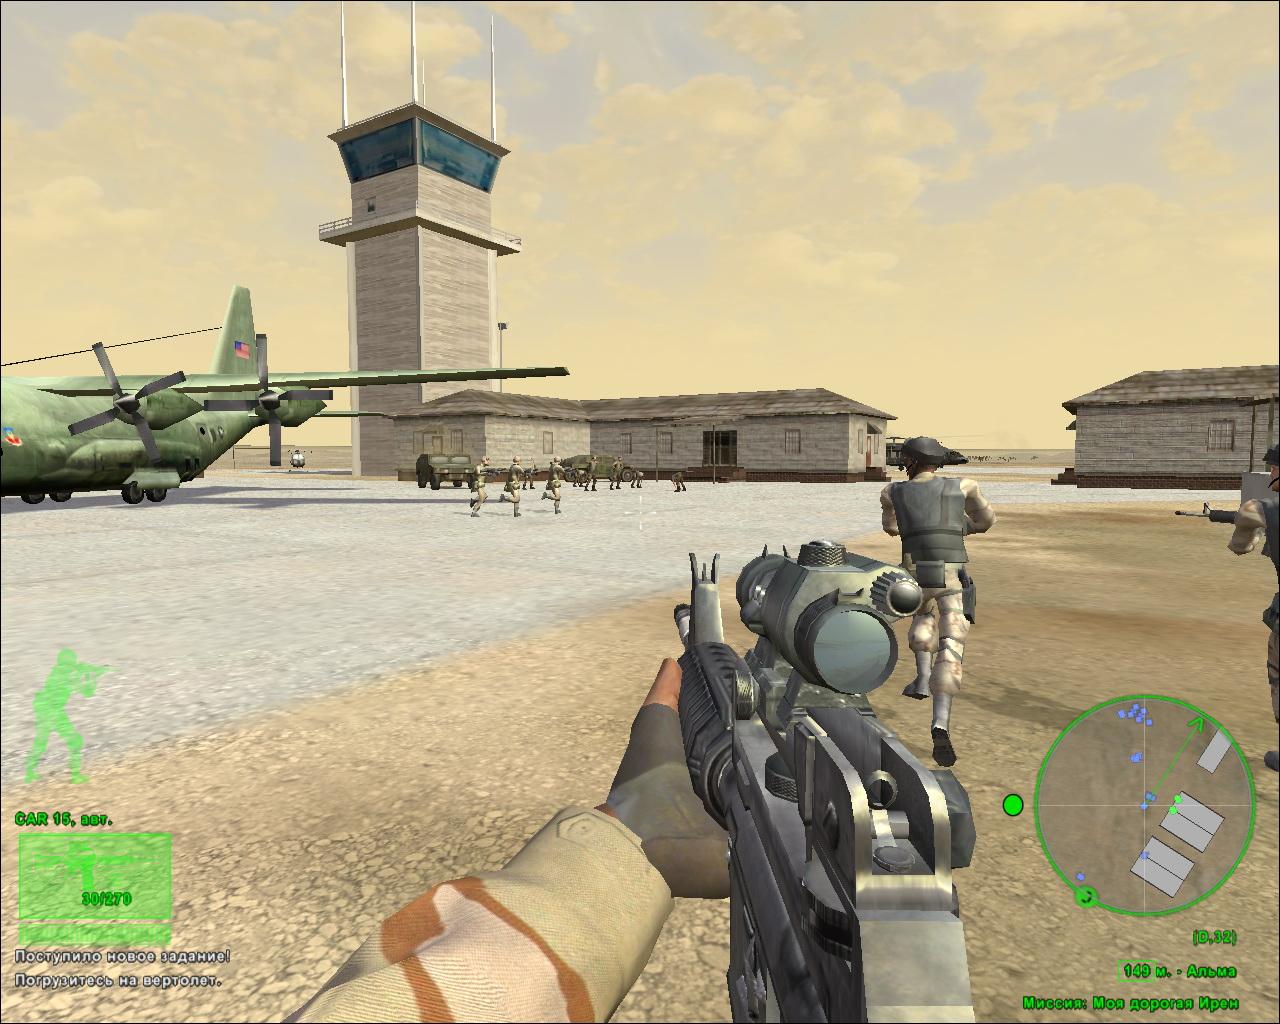 Black hawk uh-60